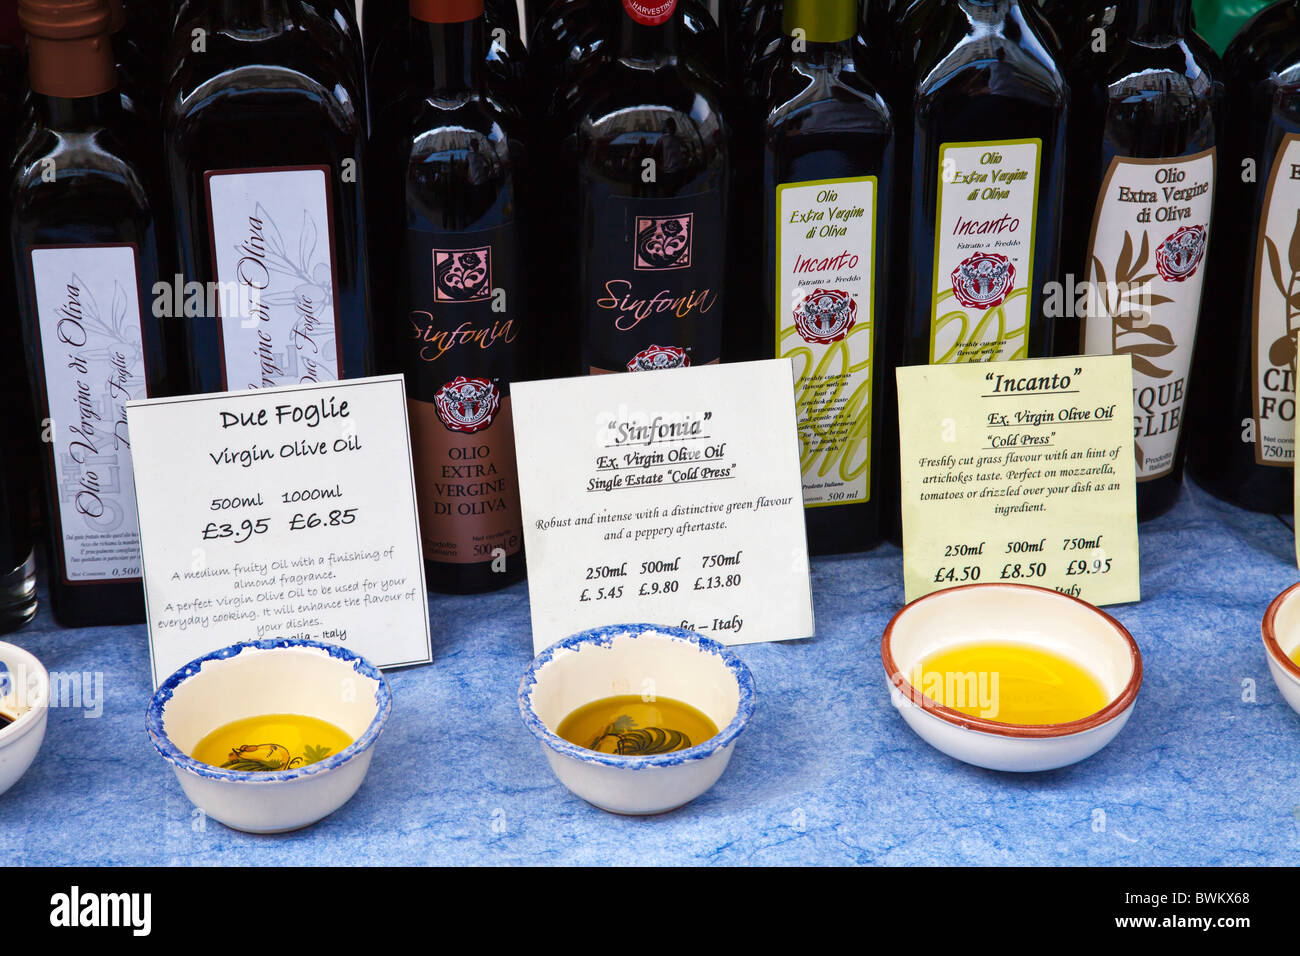 Olive oil selection at Portobello Road market - Stock Image